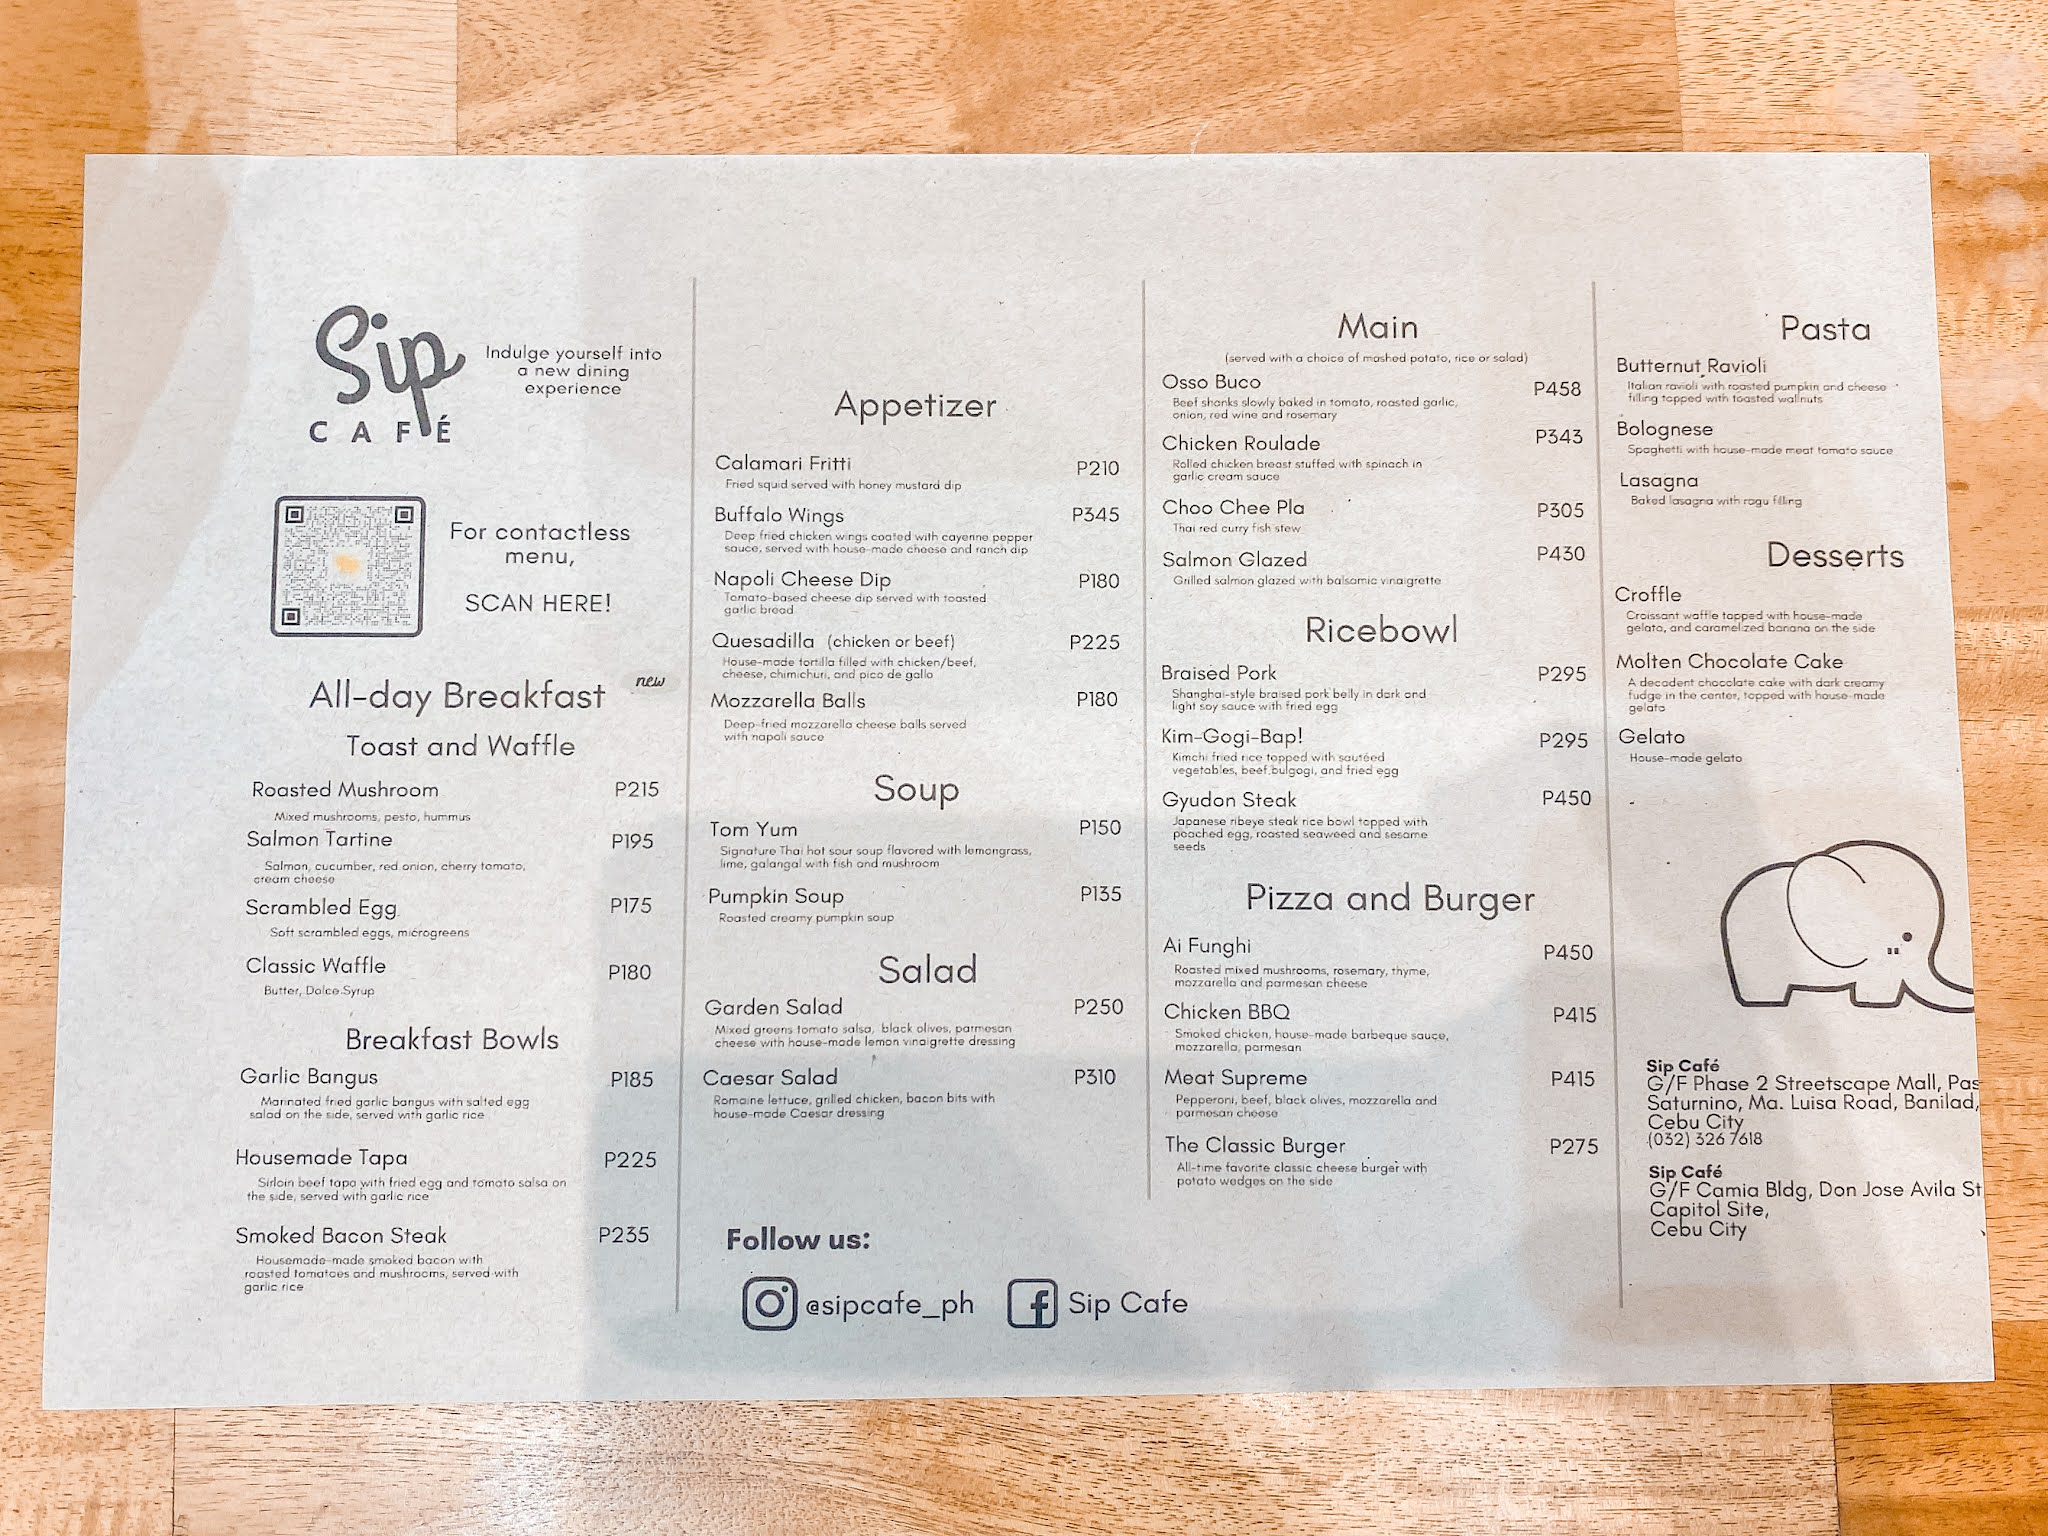 Sip Café